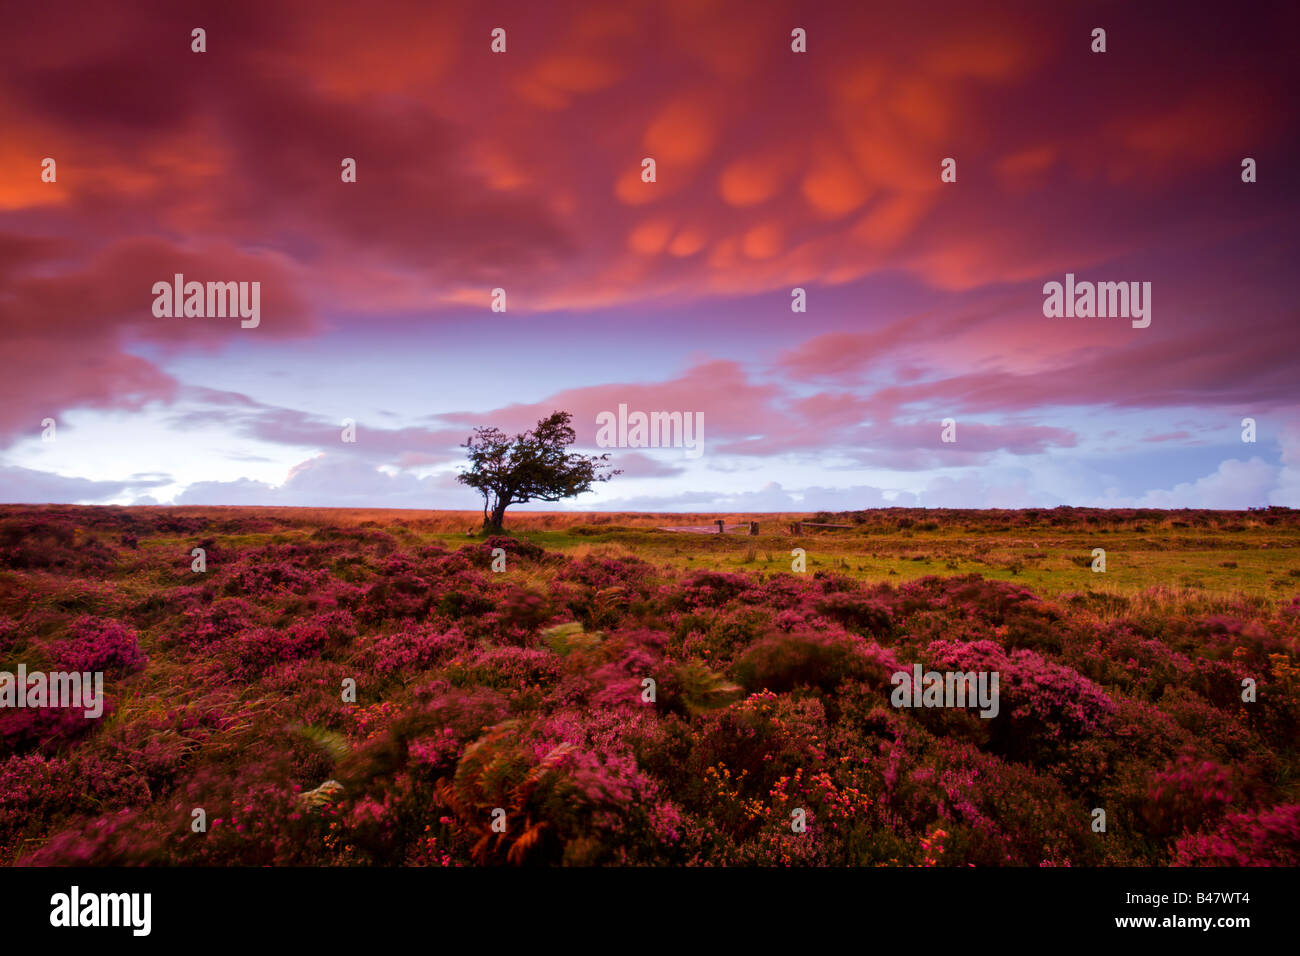 Tempestoso tramonto del heather tappezzate Dunkery Collina Parco Nazionale di Exmoor Somerset Inghilterra Foto Stock